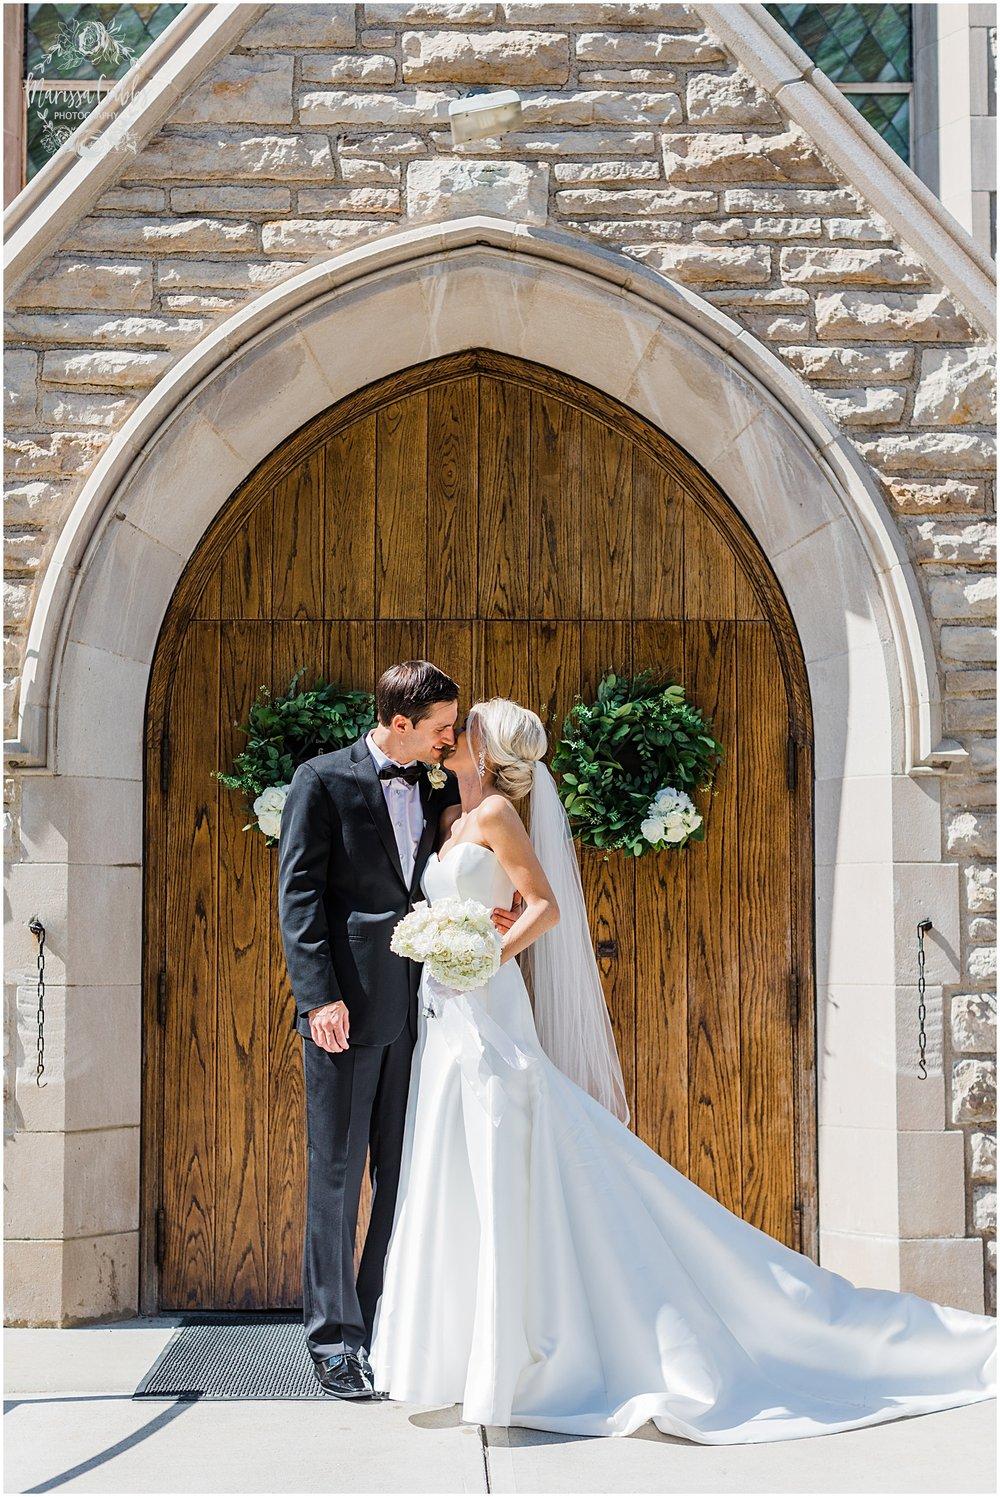 NOLL WEDDING | THE BRASS ON BALTIMORE | MARISSA CRIBBS PHOTOGRAPHY_6296.jpg